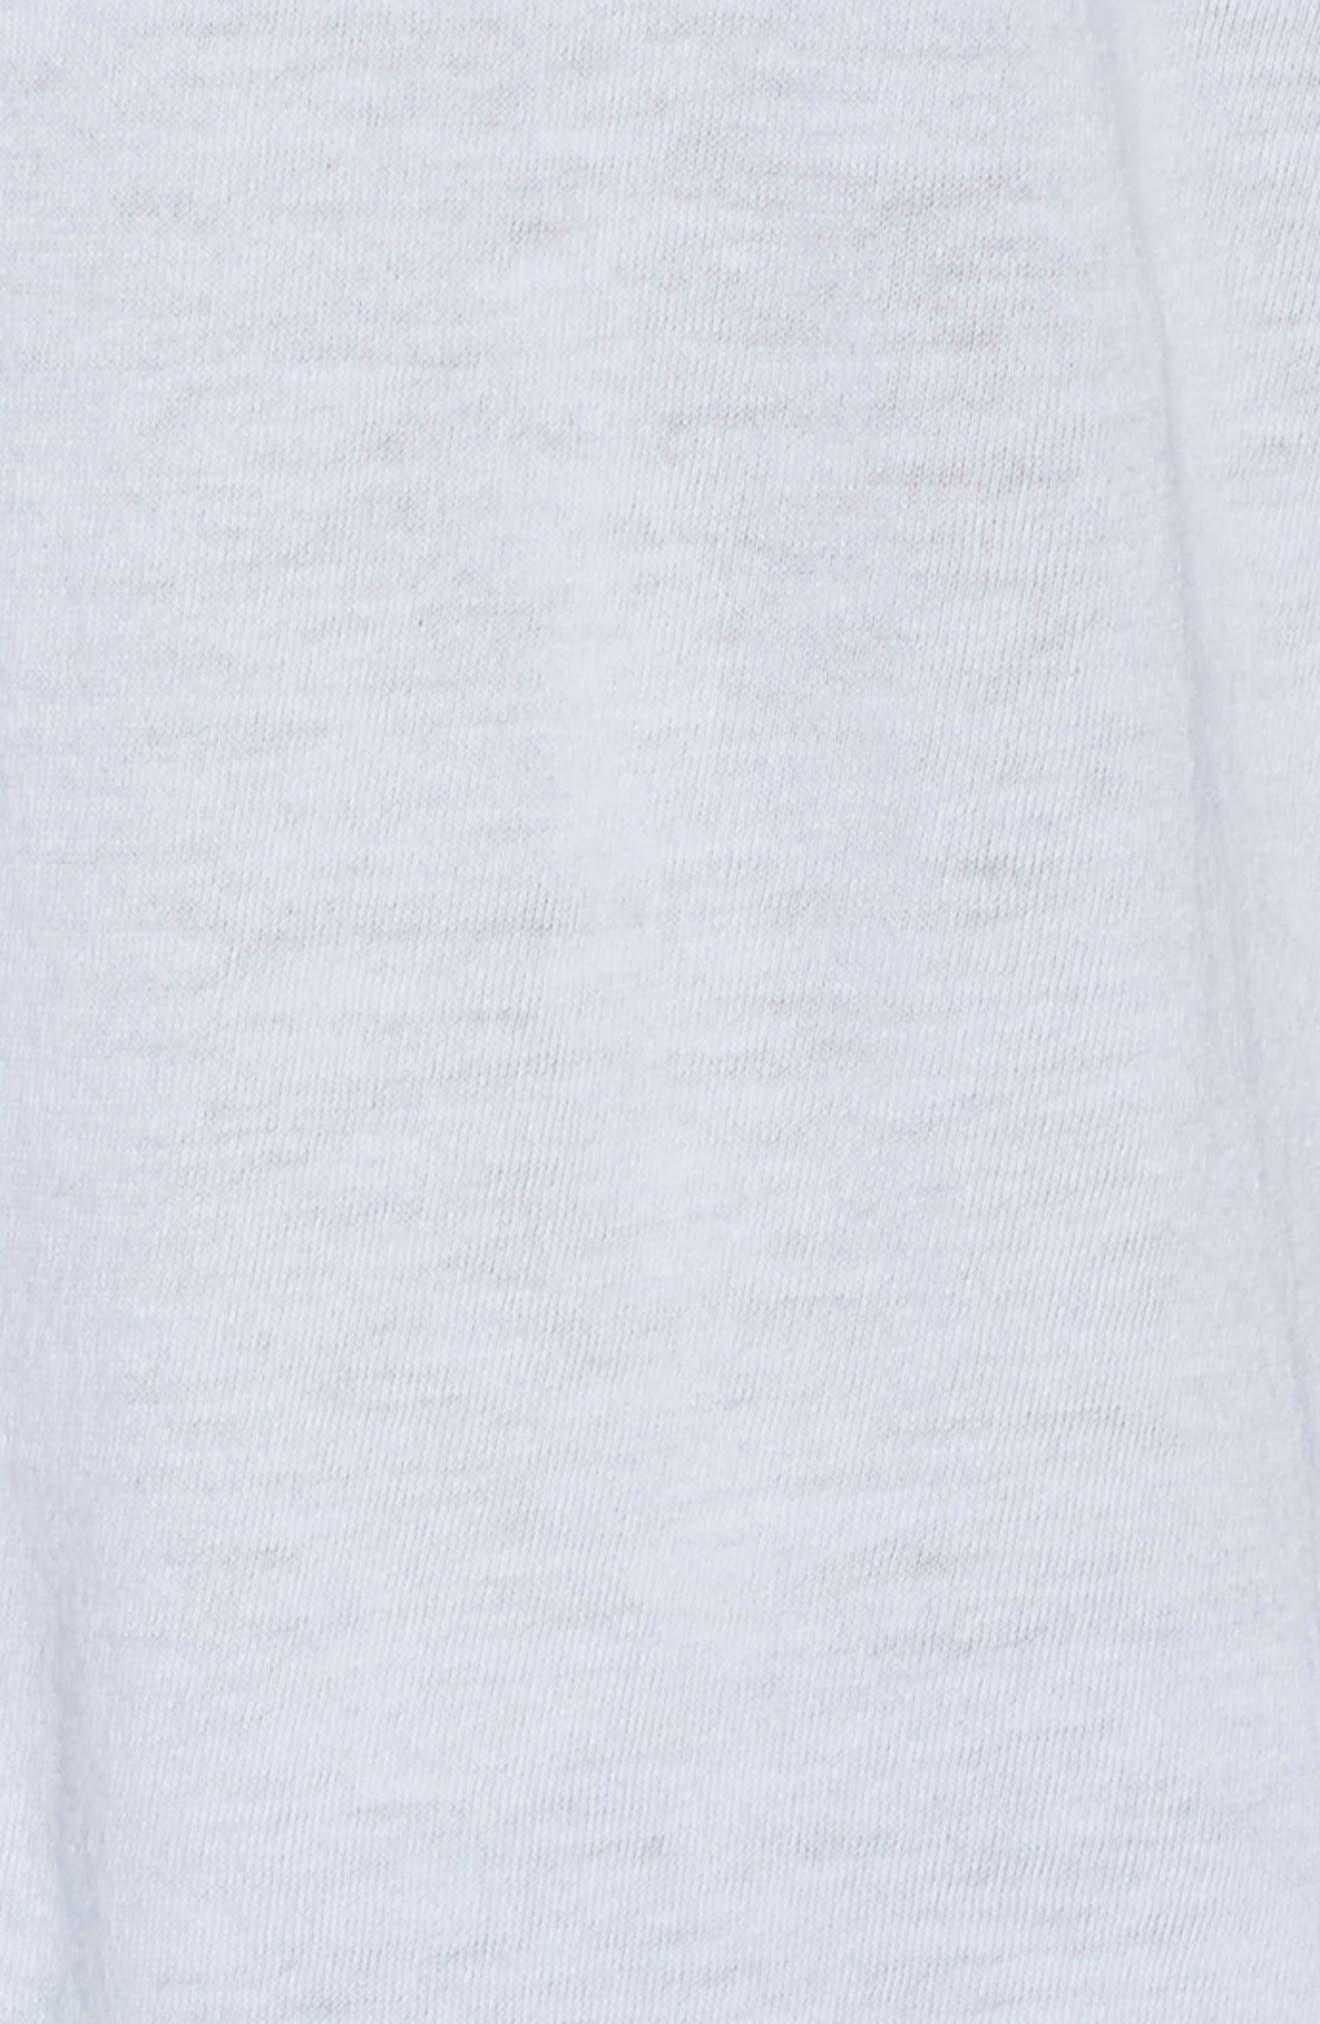 Super Slick Pullover,                             Alternate thumbnail 21, color,